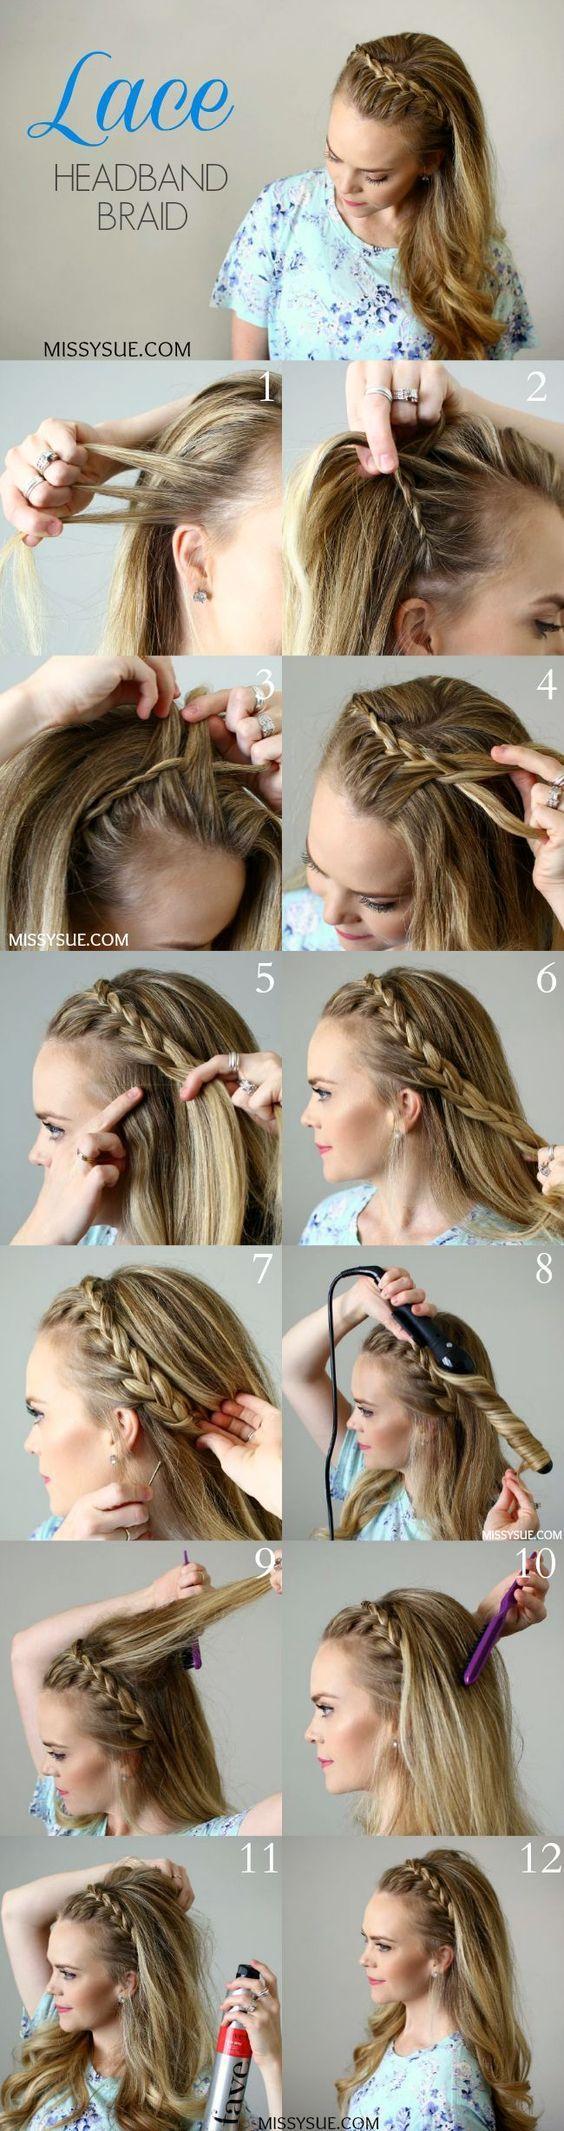 kafa bandı örgü uzun saç öğretici / http://www.himisspuff.com/easy-diy-braided-hairstyles-tutorials/5/: